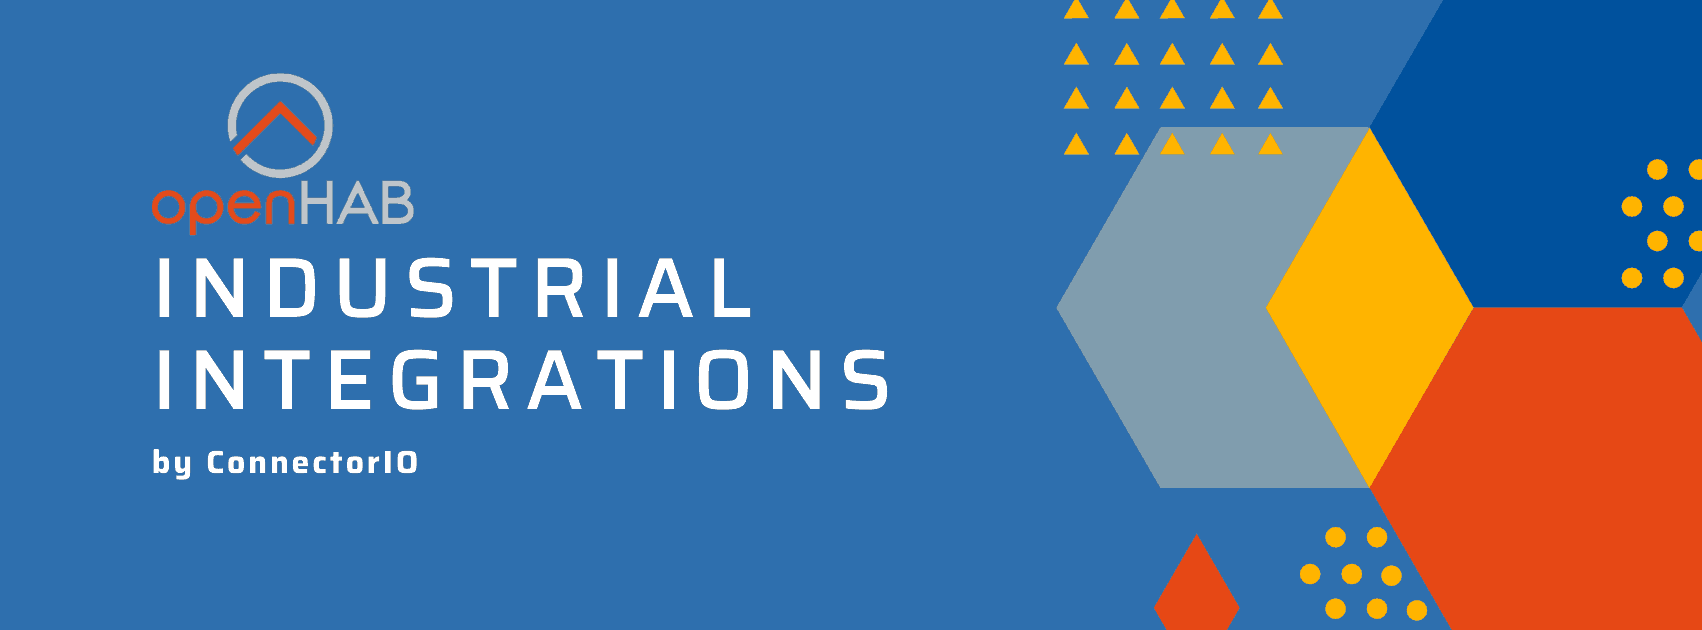 ConnectorIO openHAB Industrial Integrations